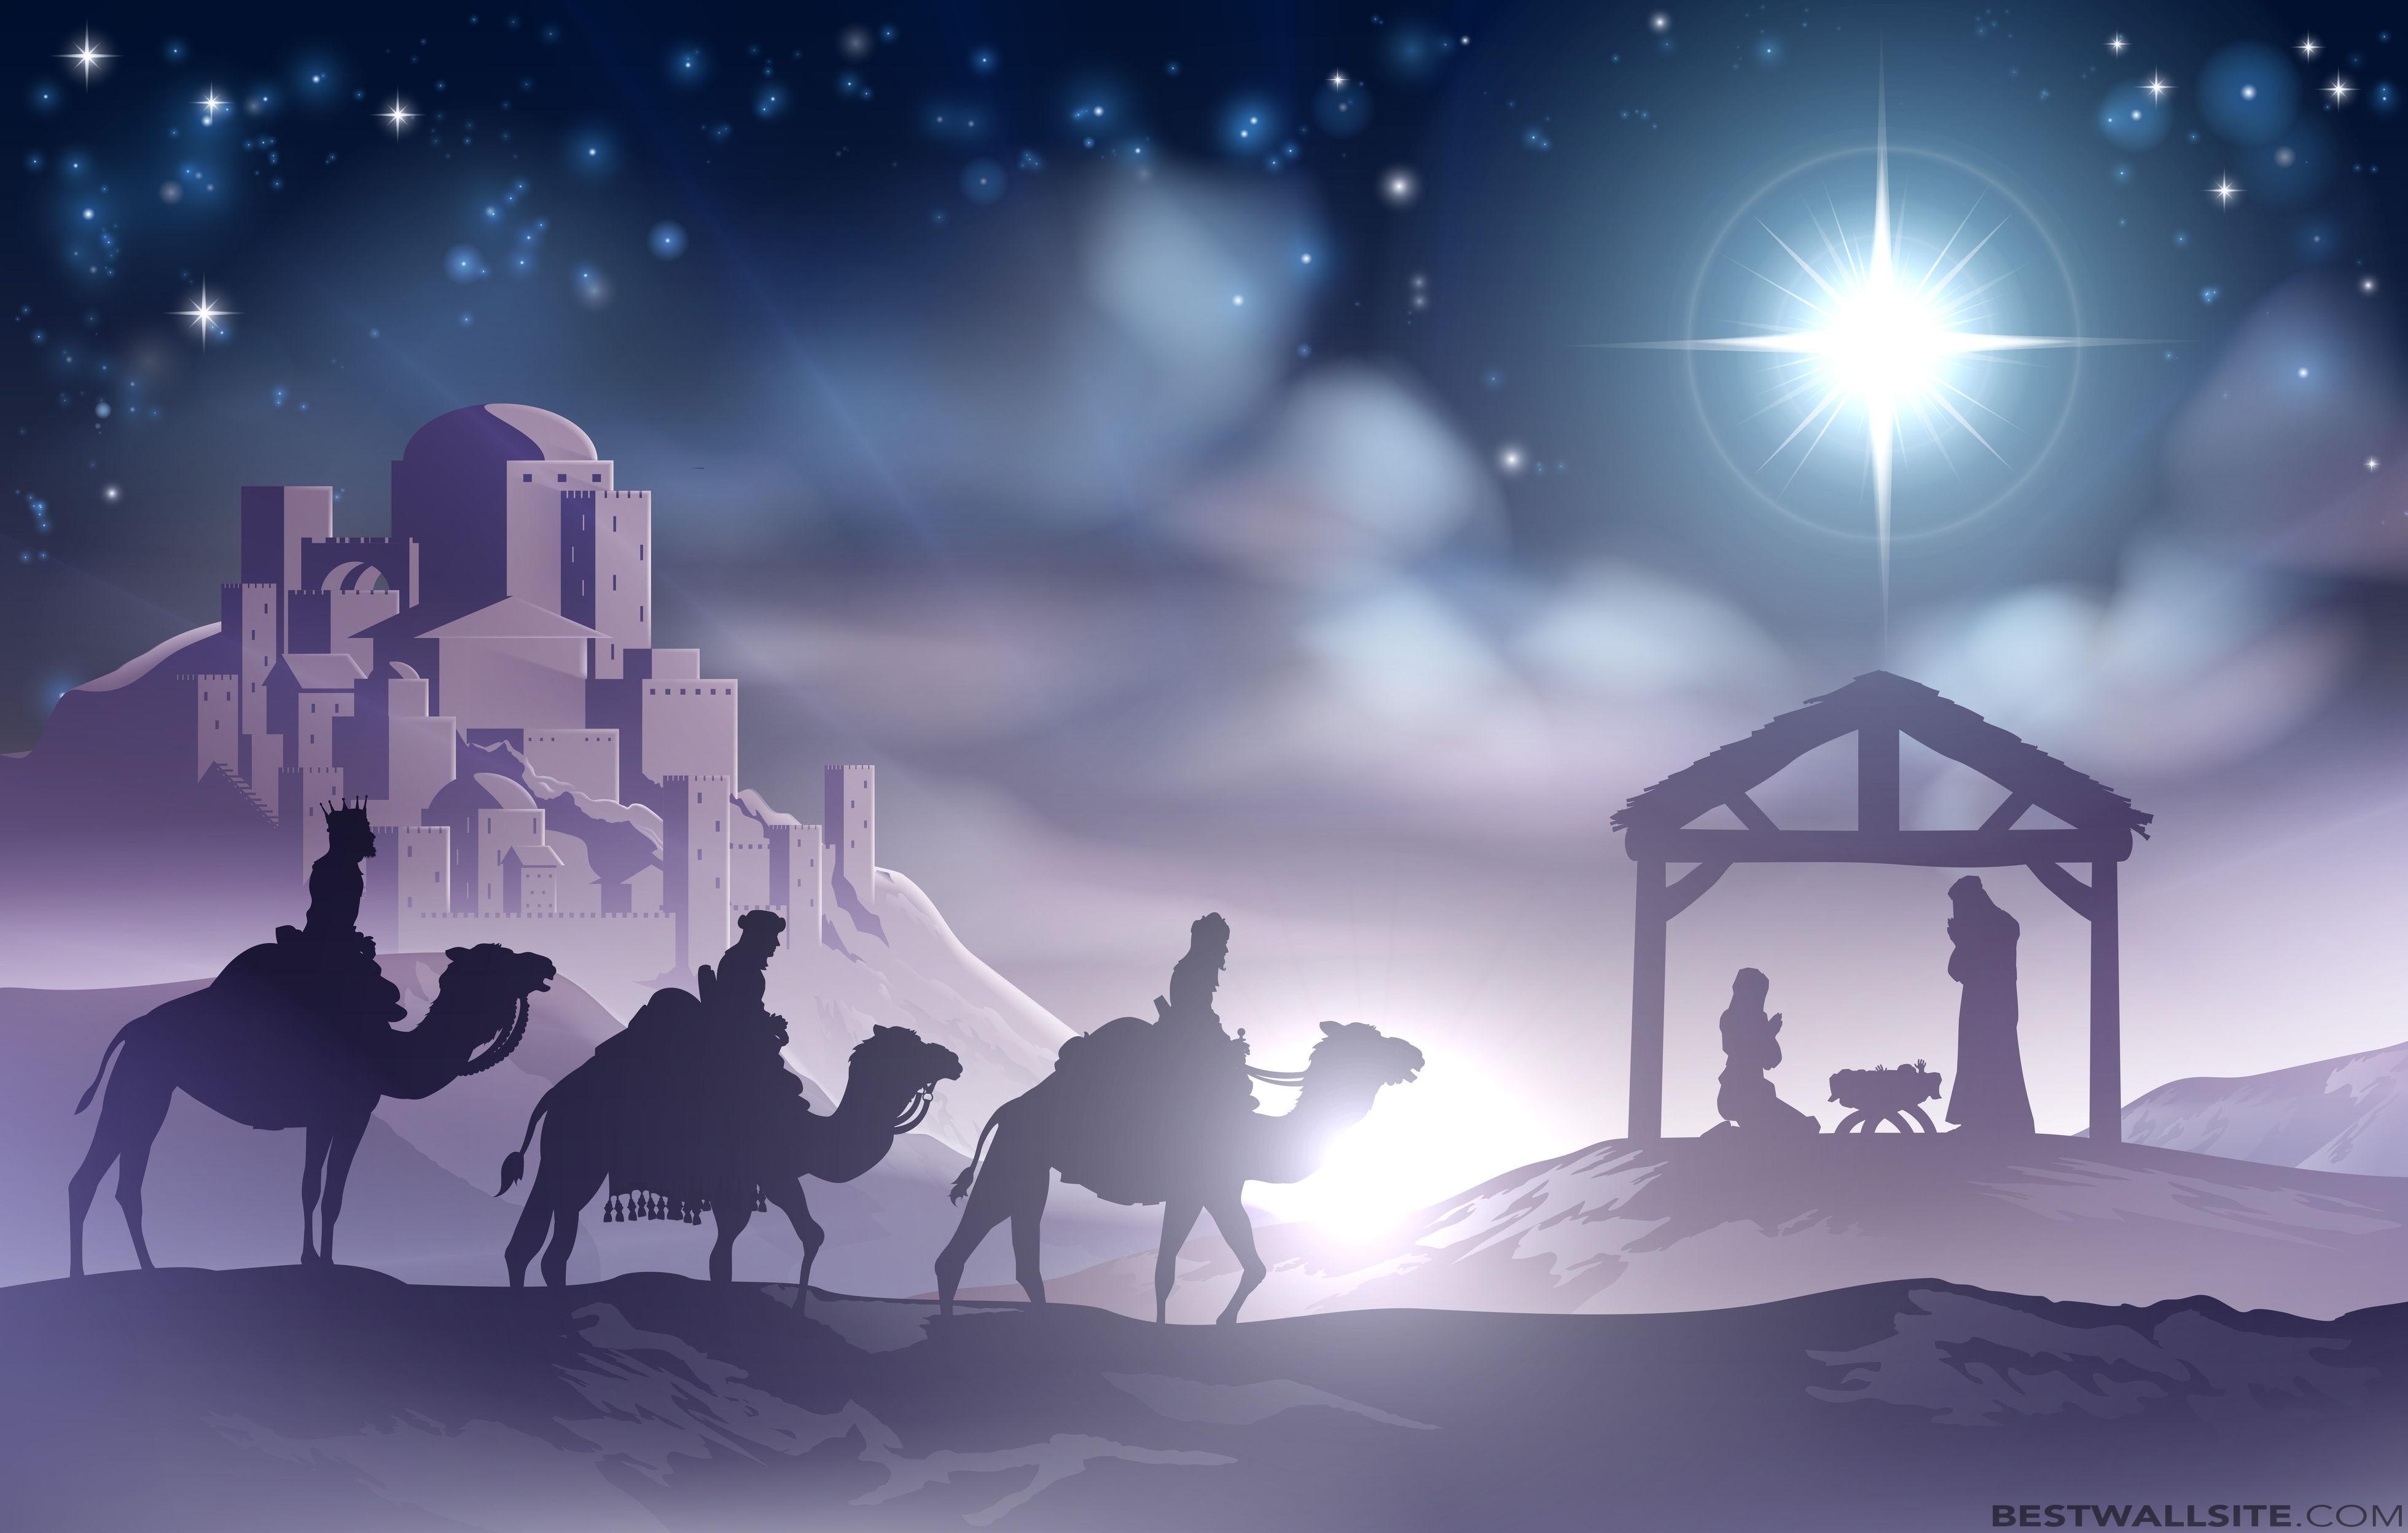 Christmas Nativity Scene Wallpaper Related Keywords 3920x2496